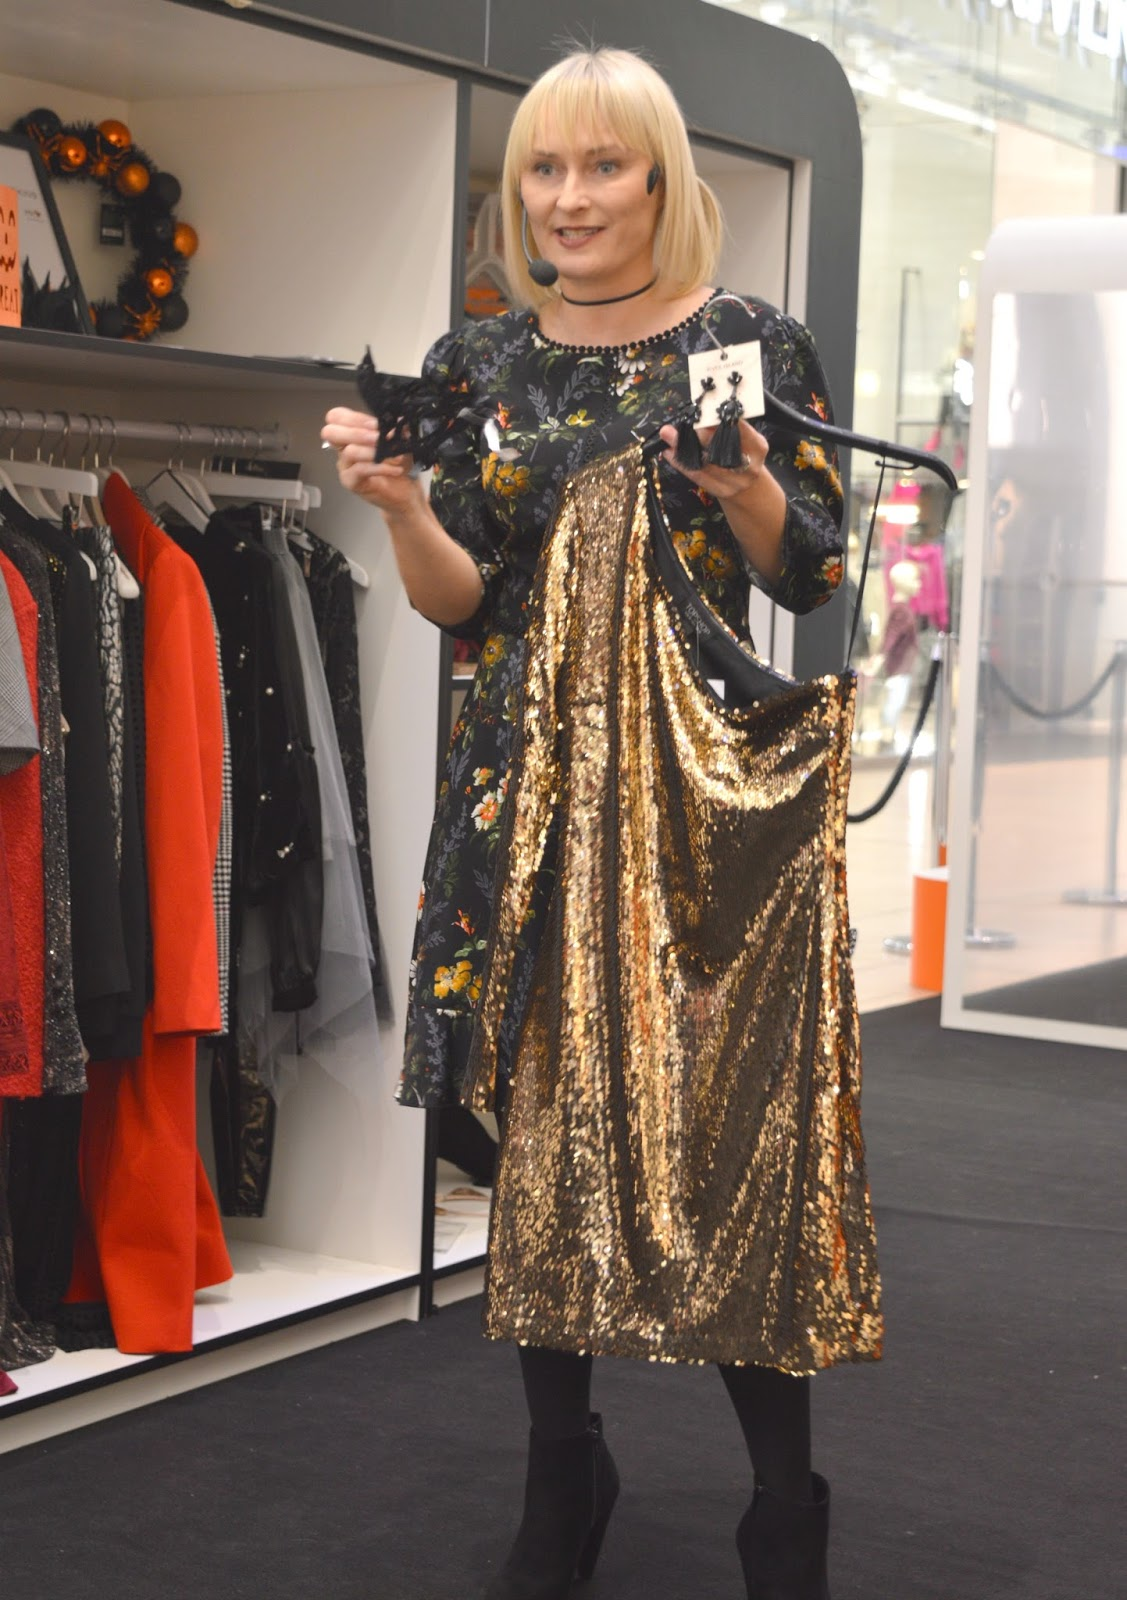 The Fashion Spooktacular Intu Eldon Square  - Halloween